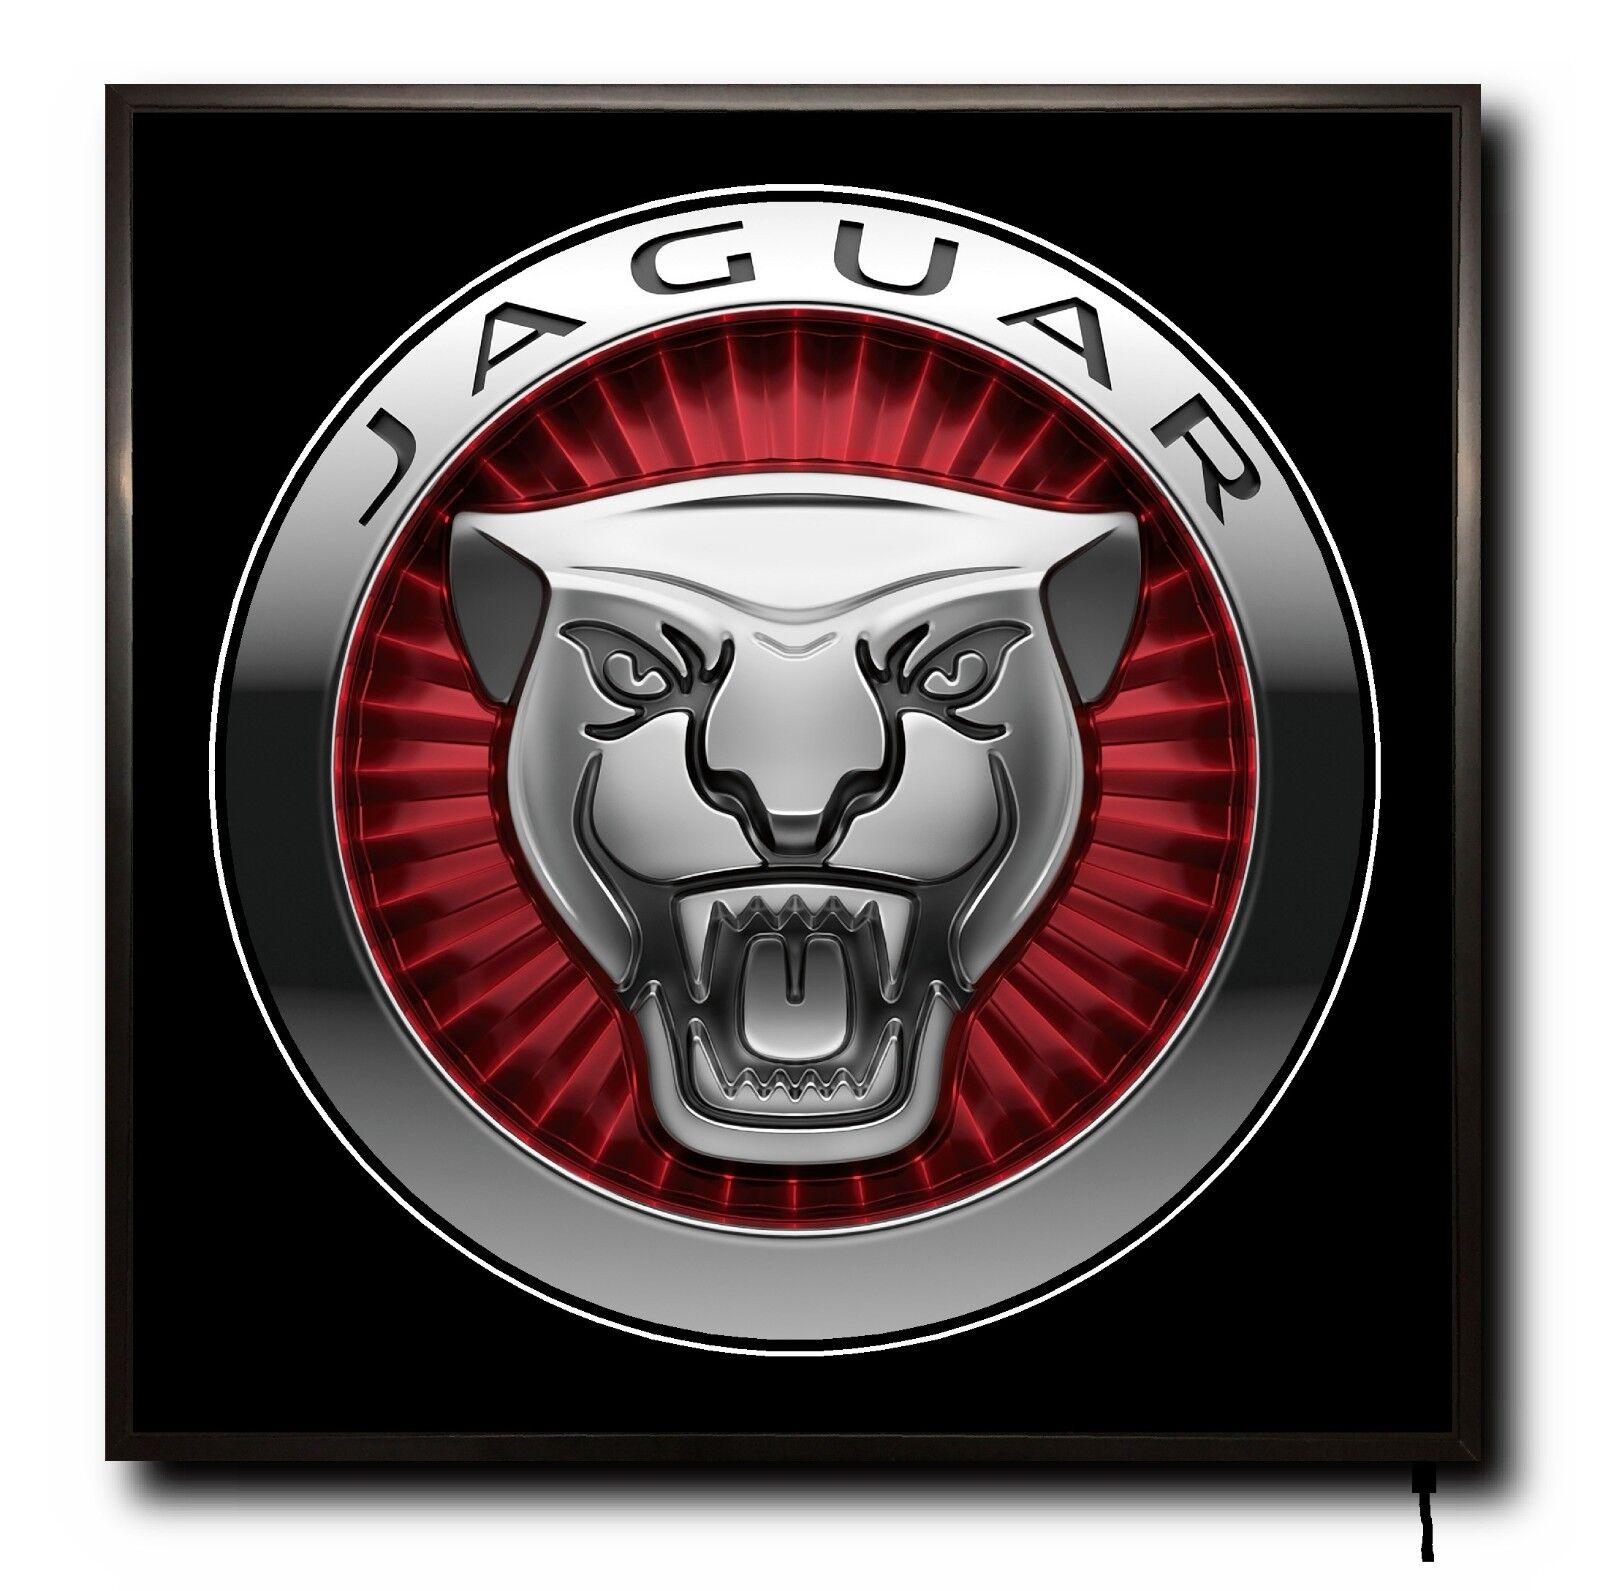 AC Cobra DEL 50 cm Light x 50 cm Wall Light cm Badge Logo De Camion Cab MAN CAVE sign  Remote 1a1a4c